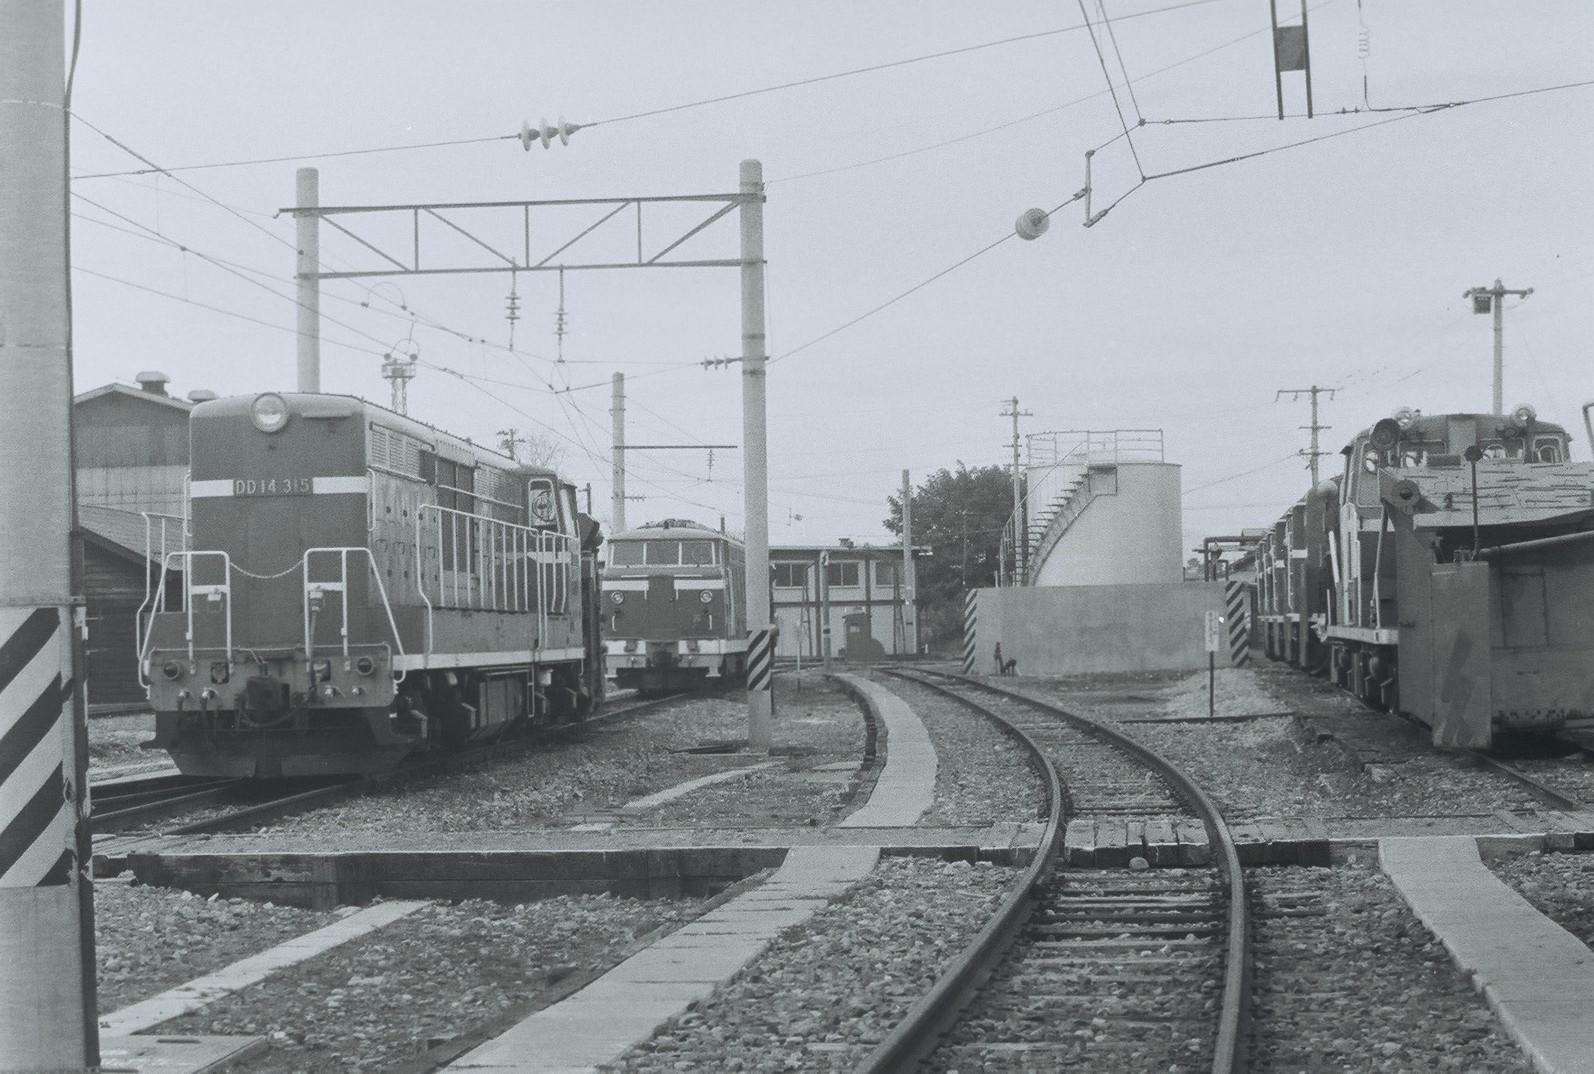 197810050230